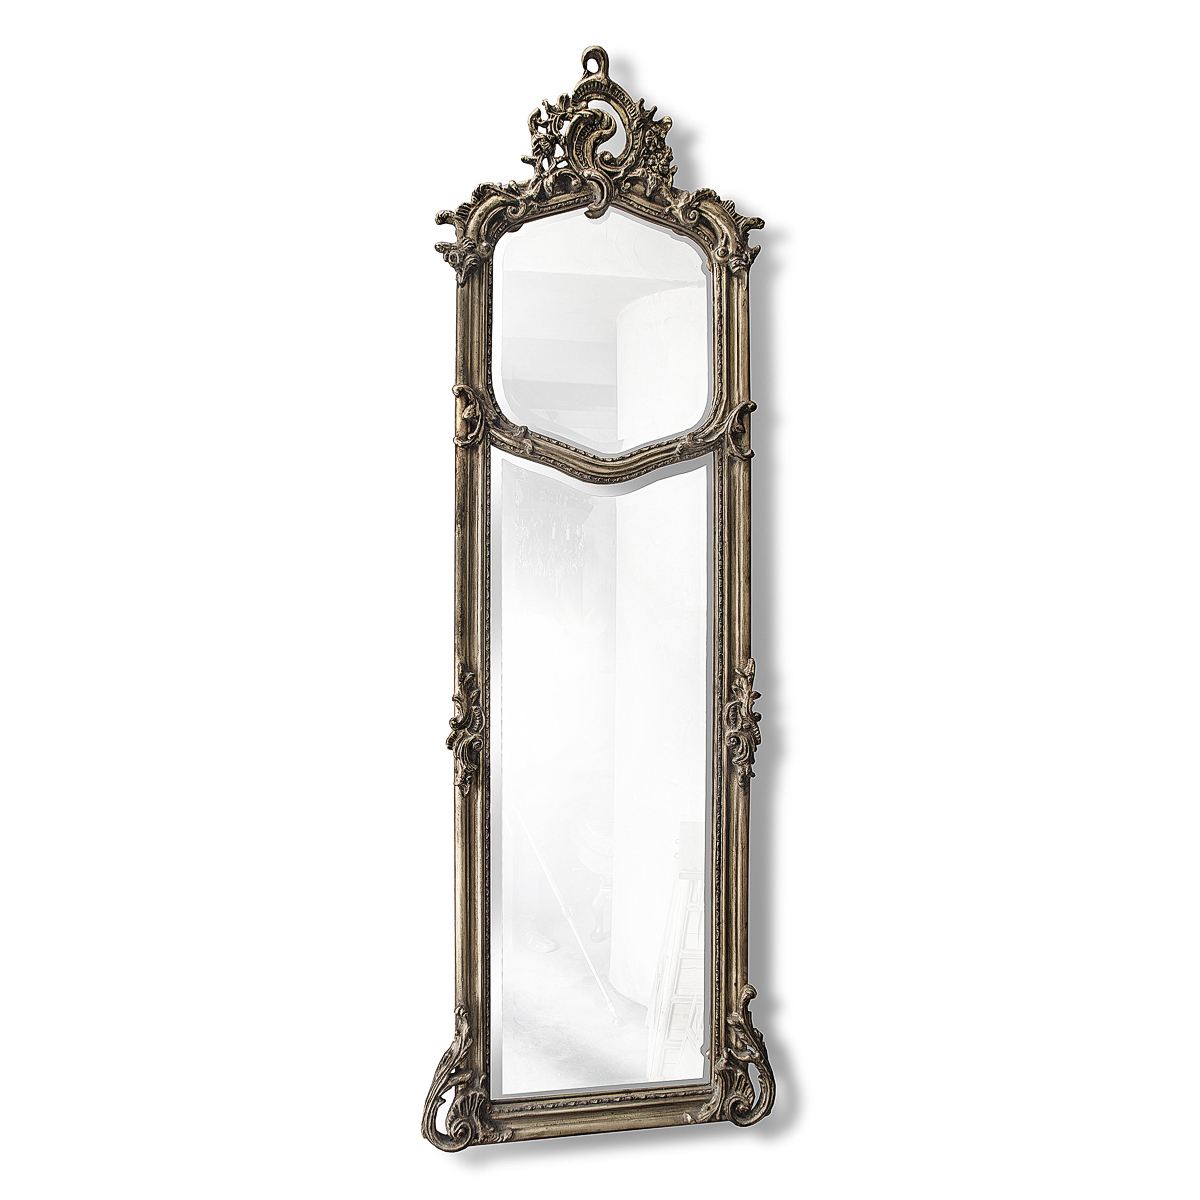 Зеркала Зеркало настенное Трумо от Roomers zerkalo-nastennoe-trumo-ot-roomers-niderlandy.jpg